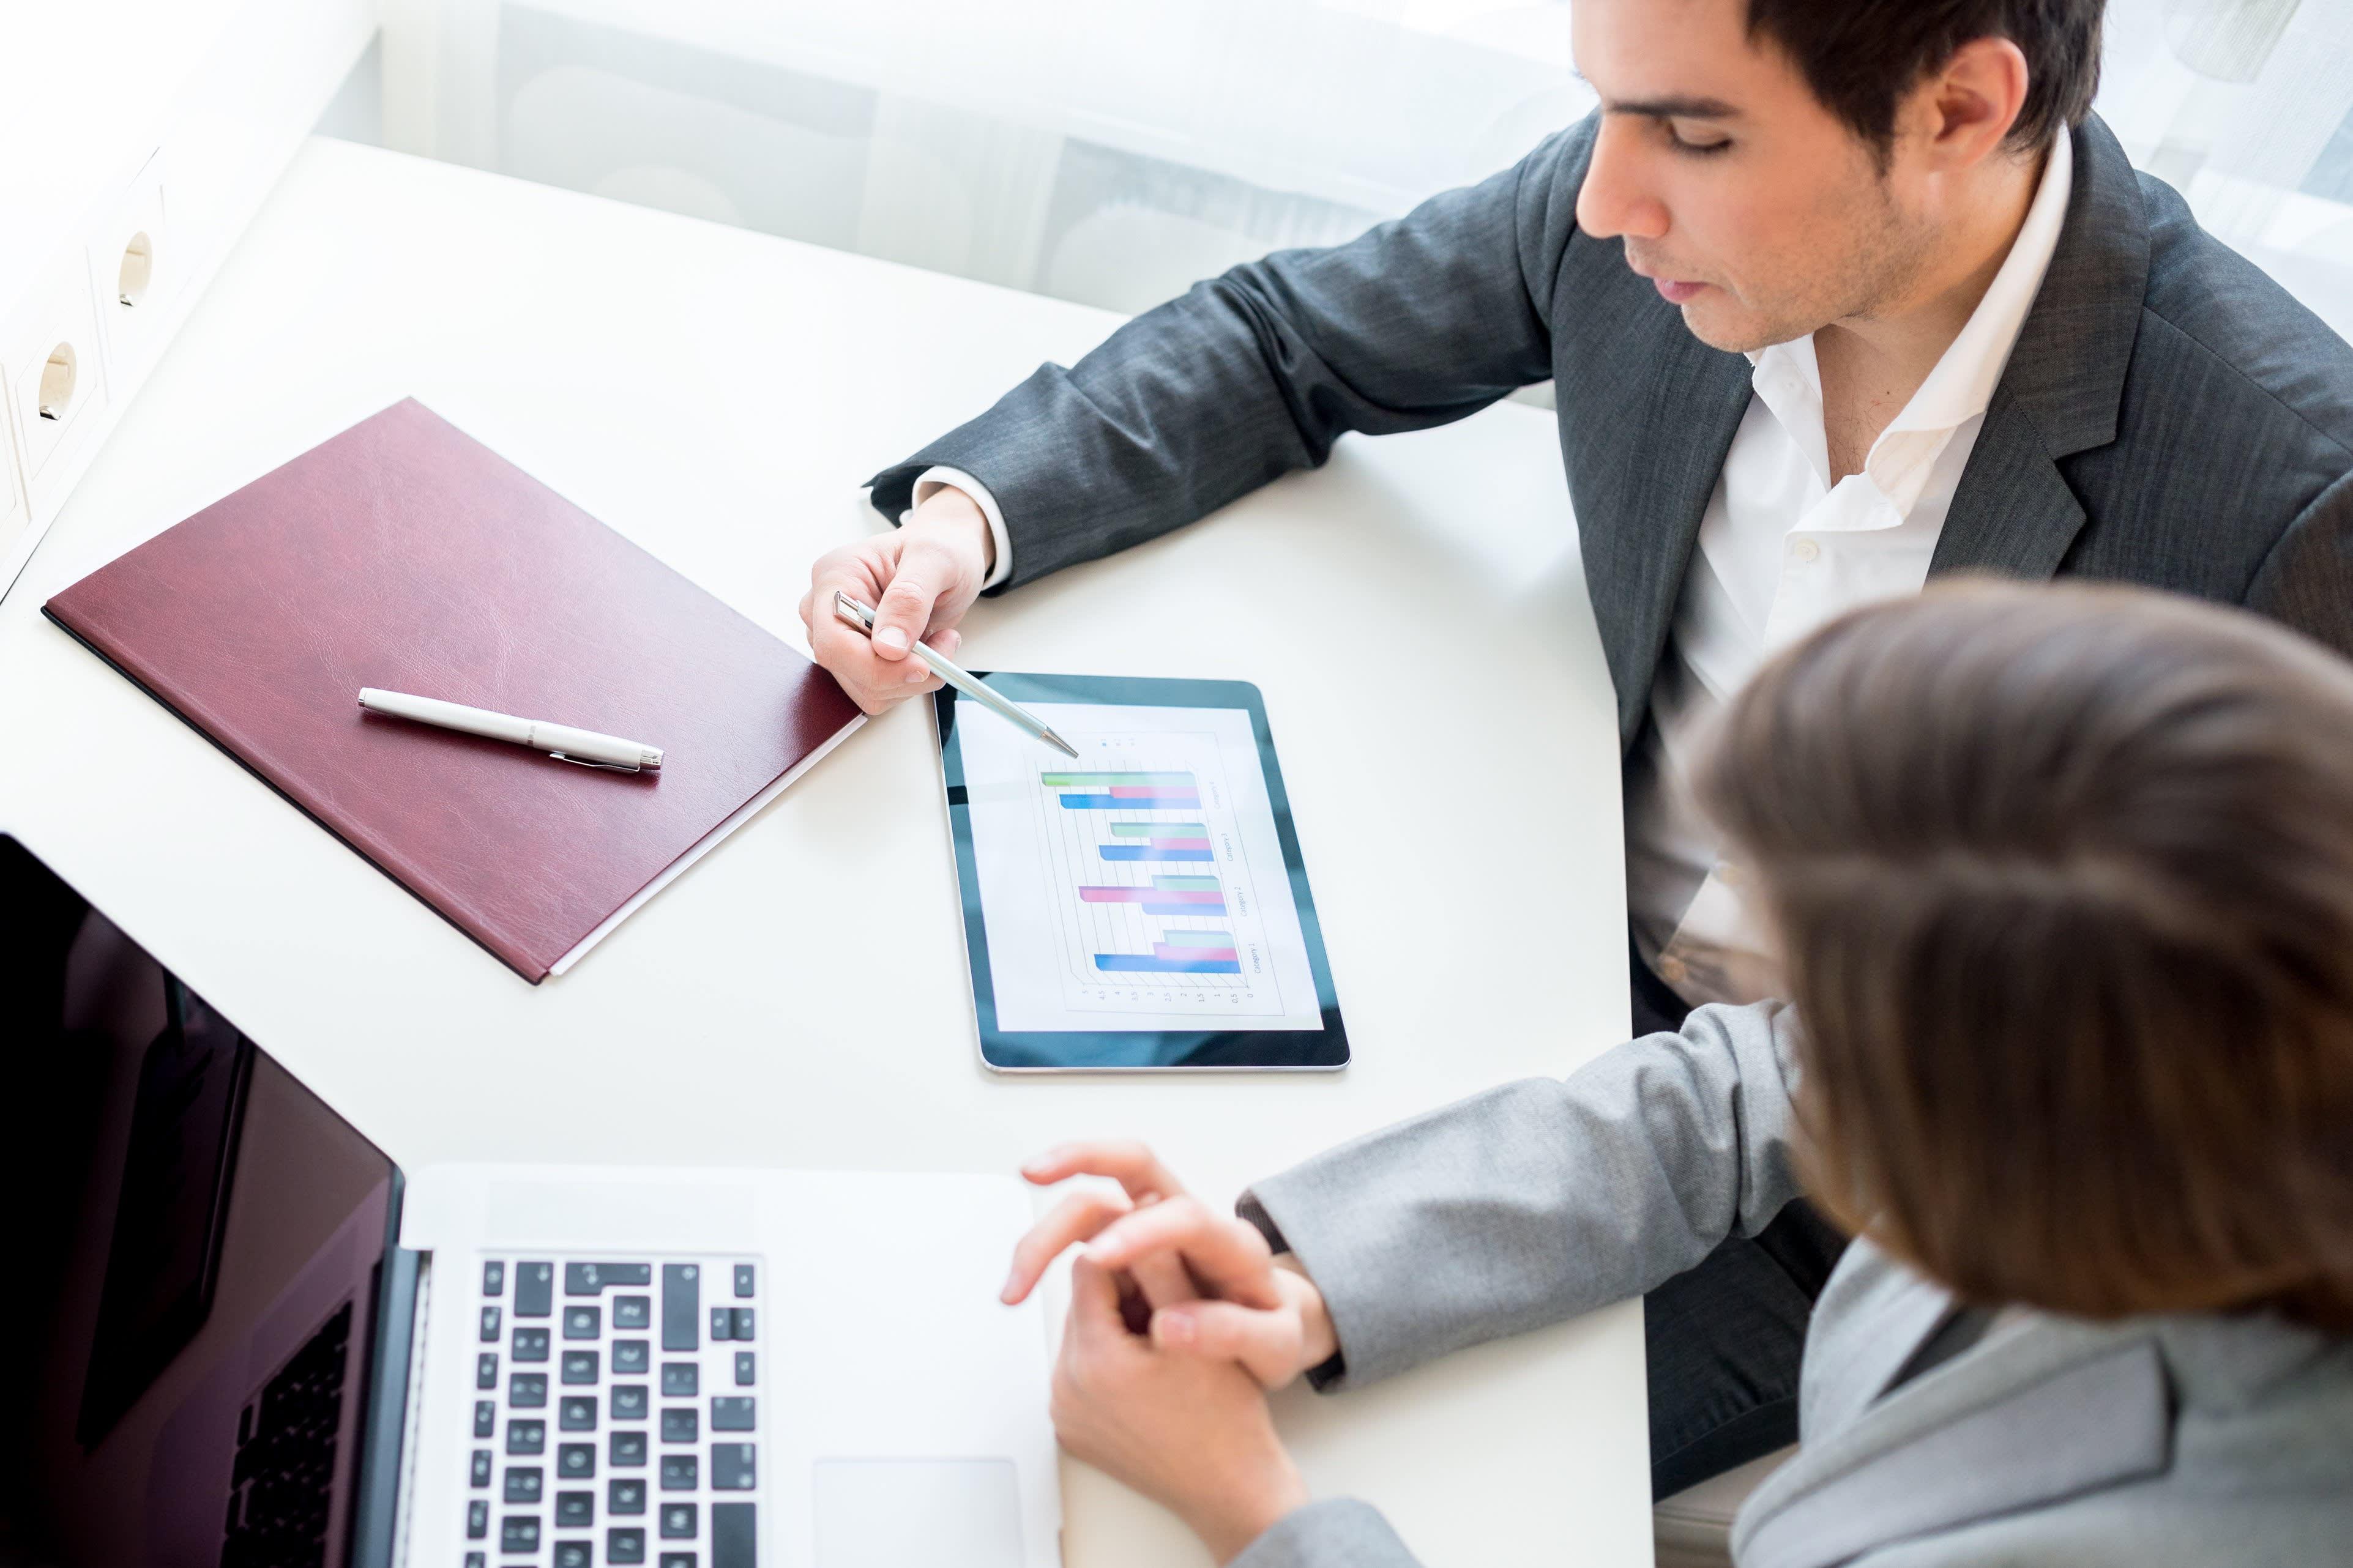 FundsNetwork accelerates platform digitisation amid Covid-19